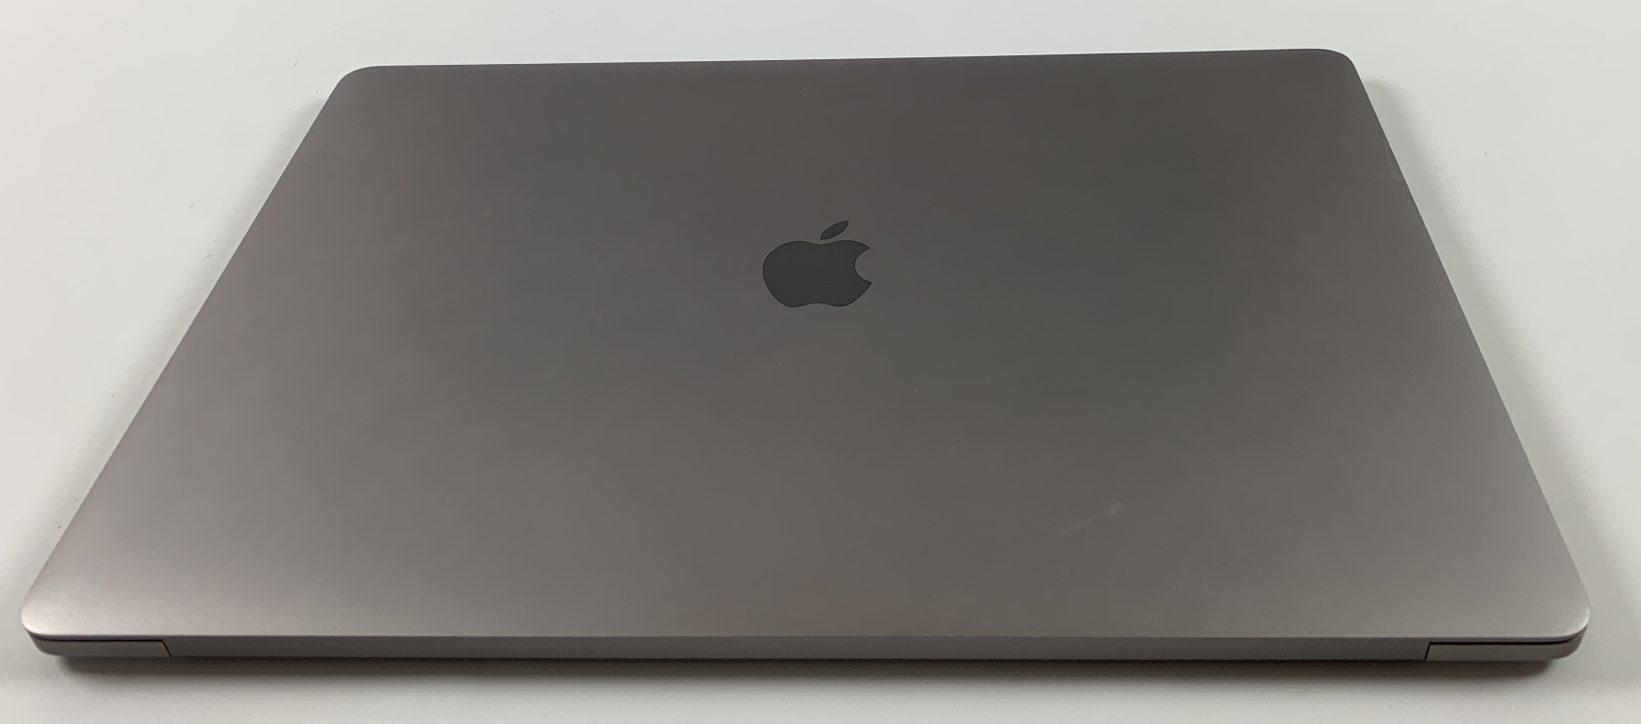 "MacBook Pro 15"" Touch Bar Late 2016 (Intel Quad-Core i7 2.6 GHz 16 GB RAM 256 GB SSD), Space Gray, Intel Quad-Core i7 2.6 GHz, 16 GB RAM, 256 GB SSD, Kuva 2"